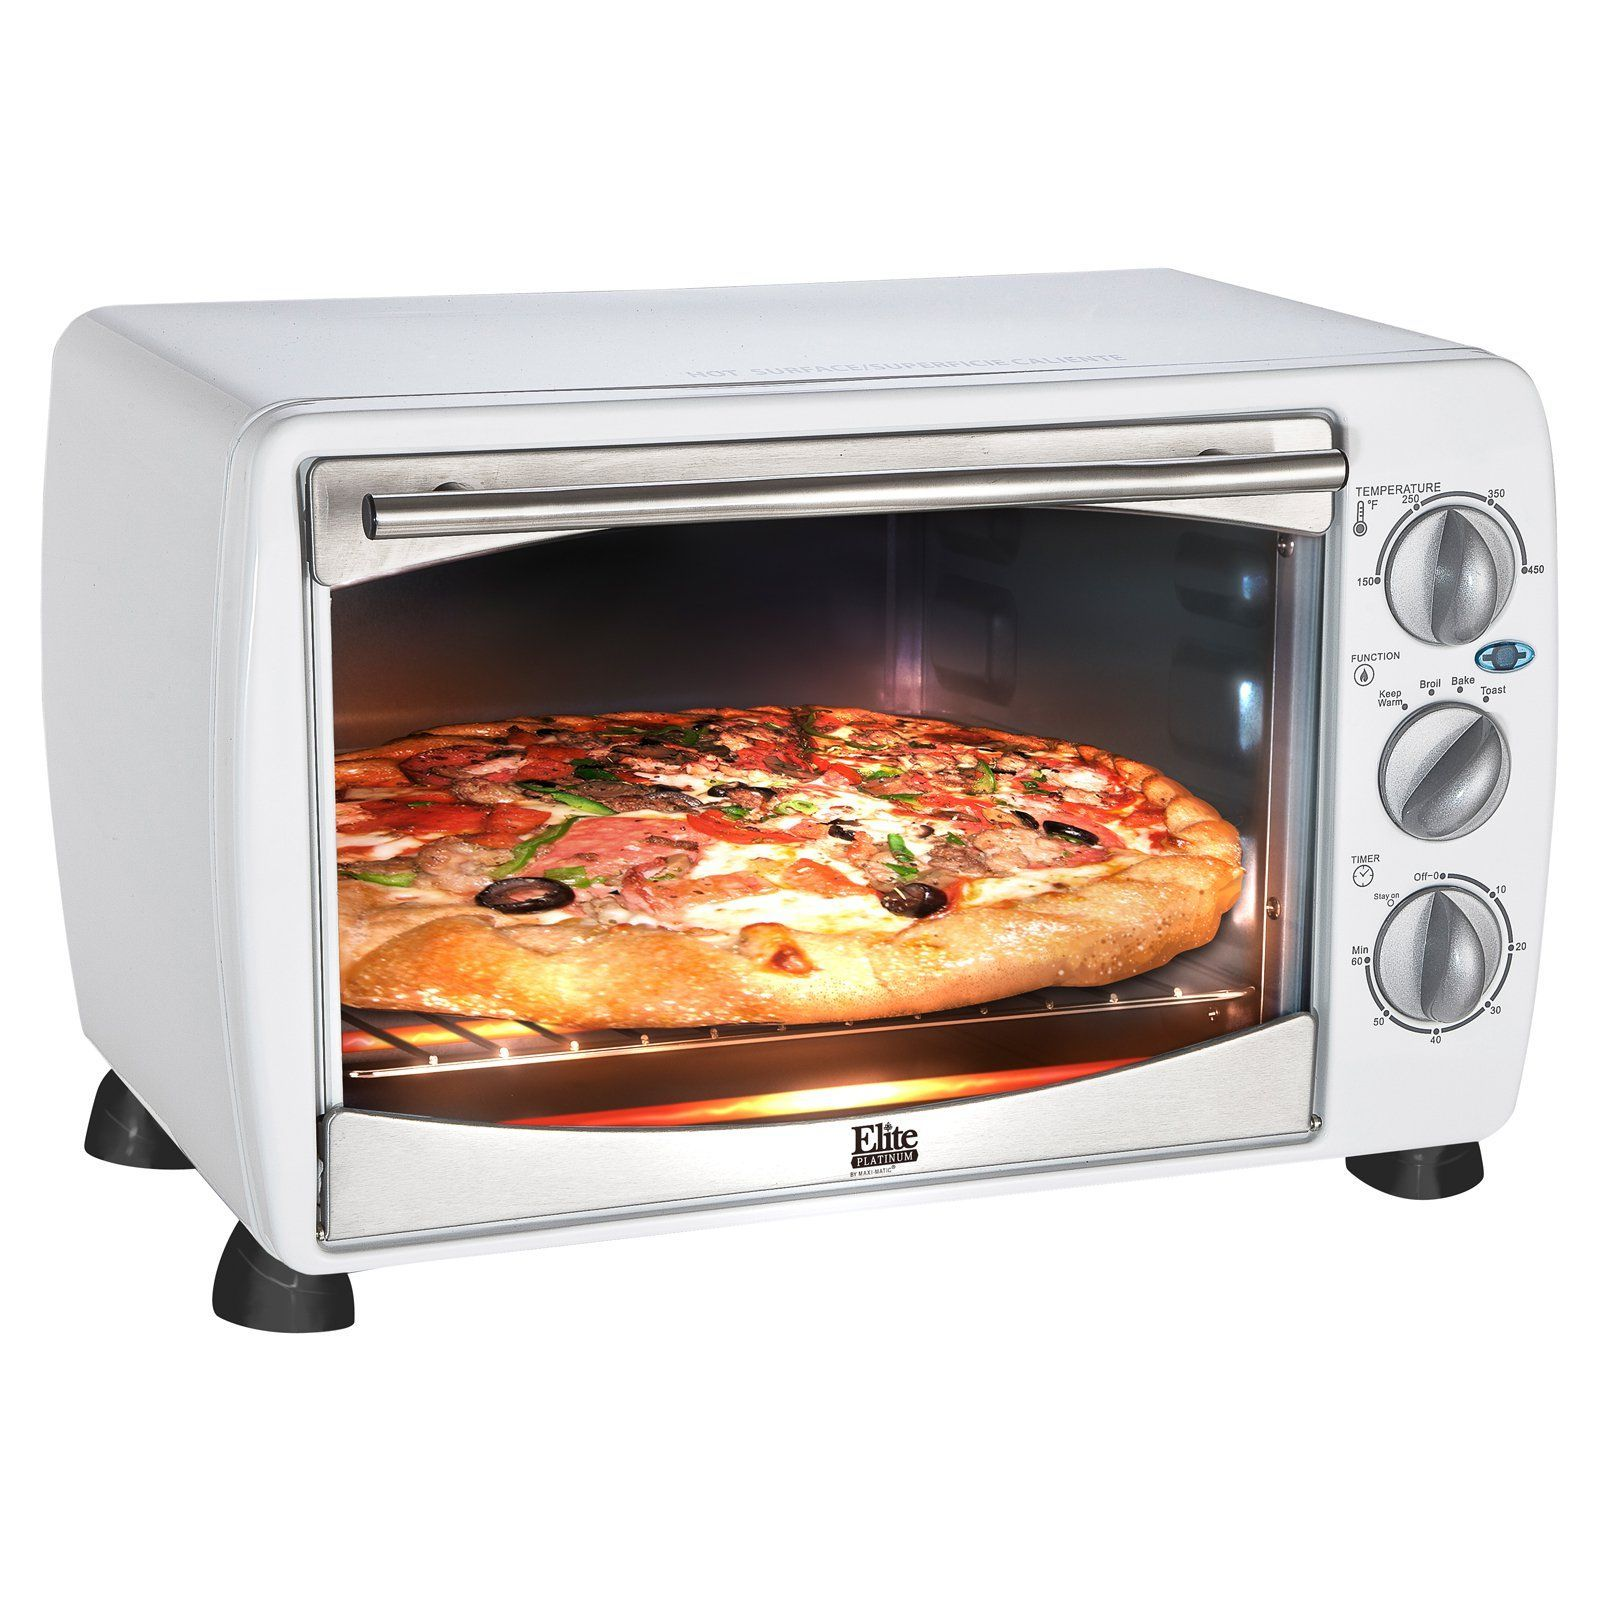 Elite Gourmet Eto 180w 6 Slice Toaster Oven Broiler Www Hayneedle Com Countertop Toaster Oven Toaster Oven Toaster